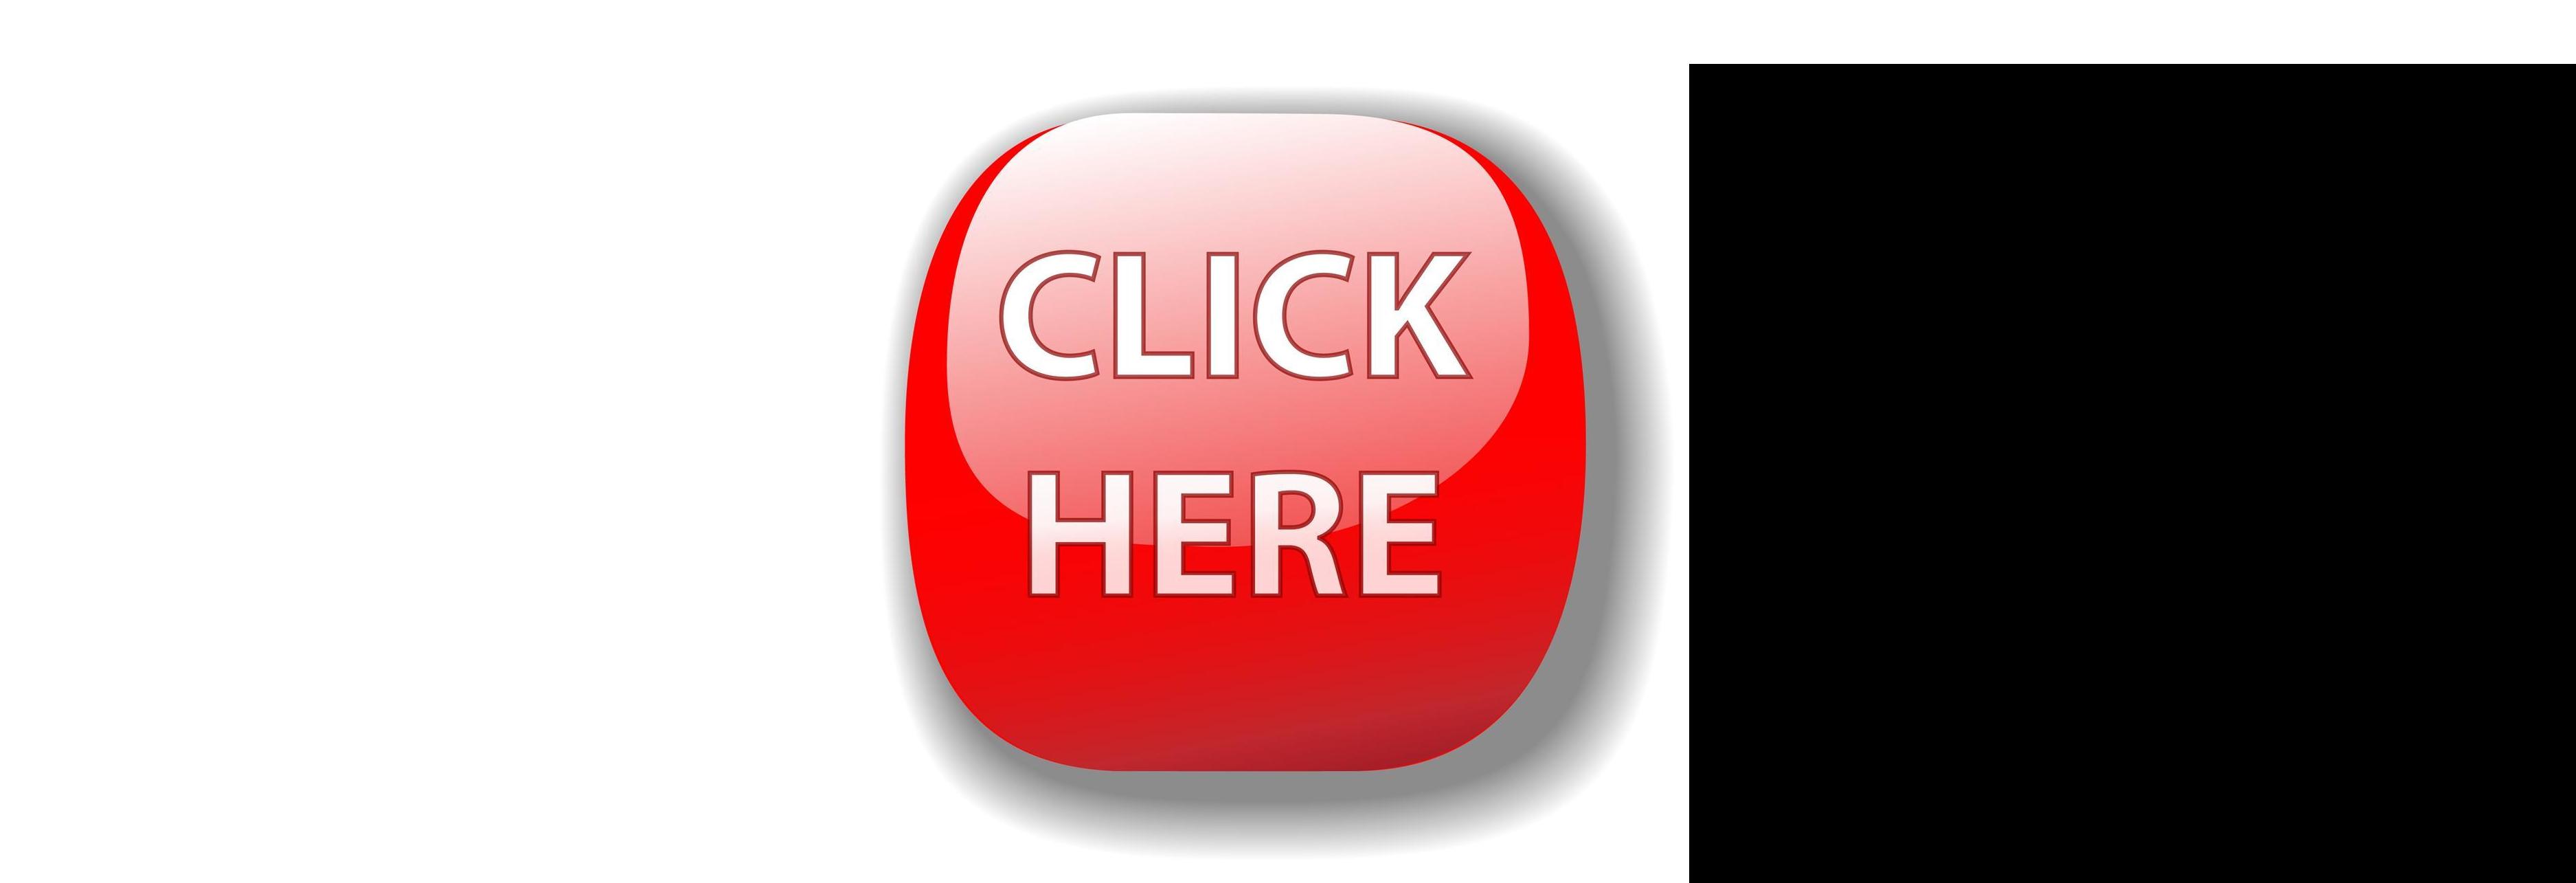 Imagehttps://www.fda.gov/emergency-preparedness-and-response/coronavirus-disease-2019-covid-19/coronavirus-disease-2019-covid